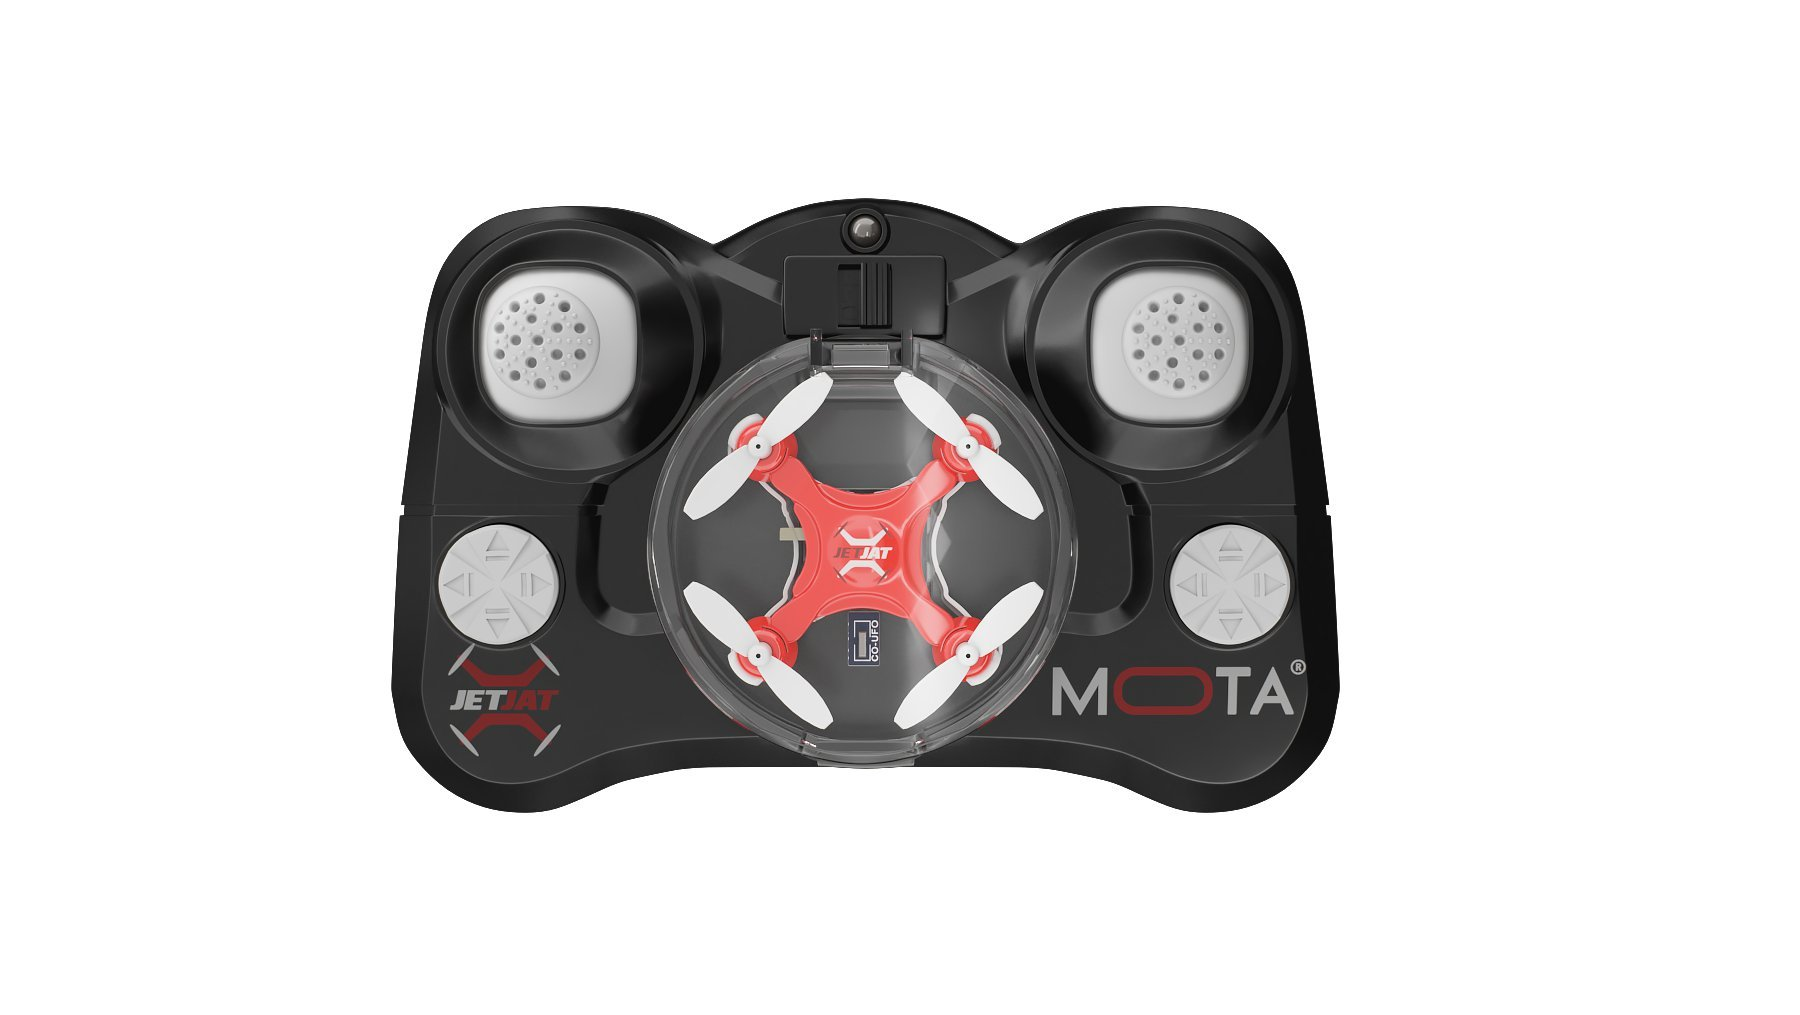 MOTA JETJAT Nano Drone Quadcopter Controller (Red)